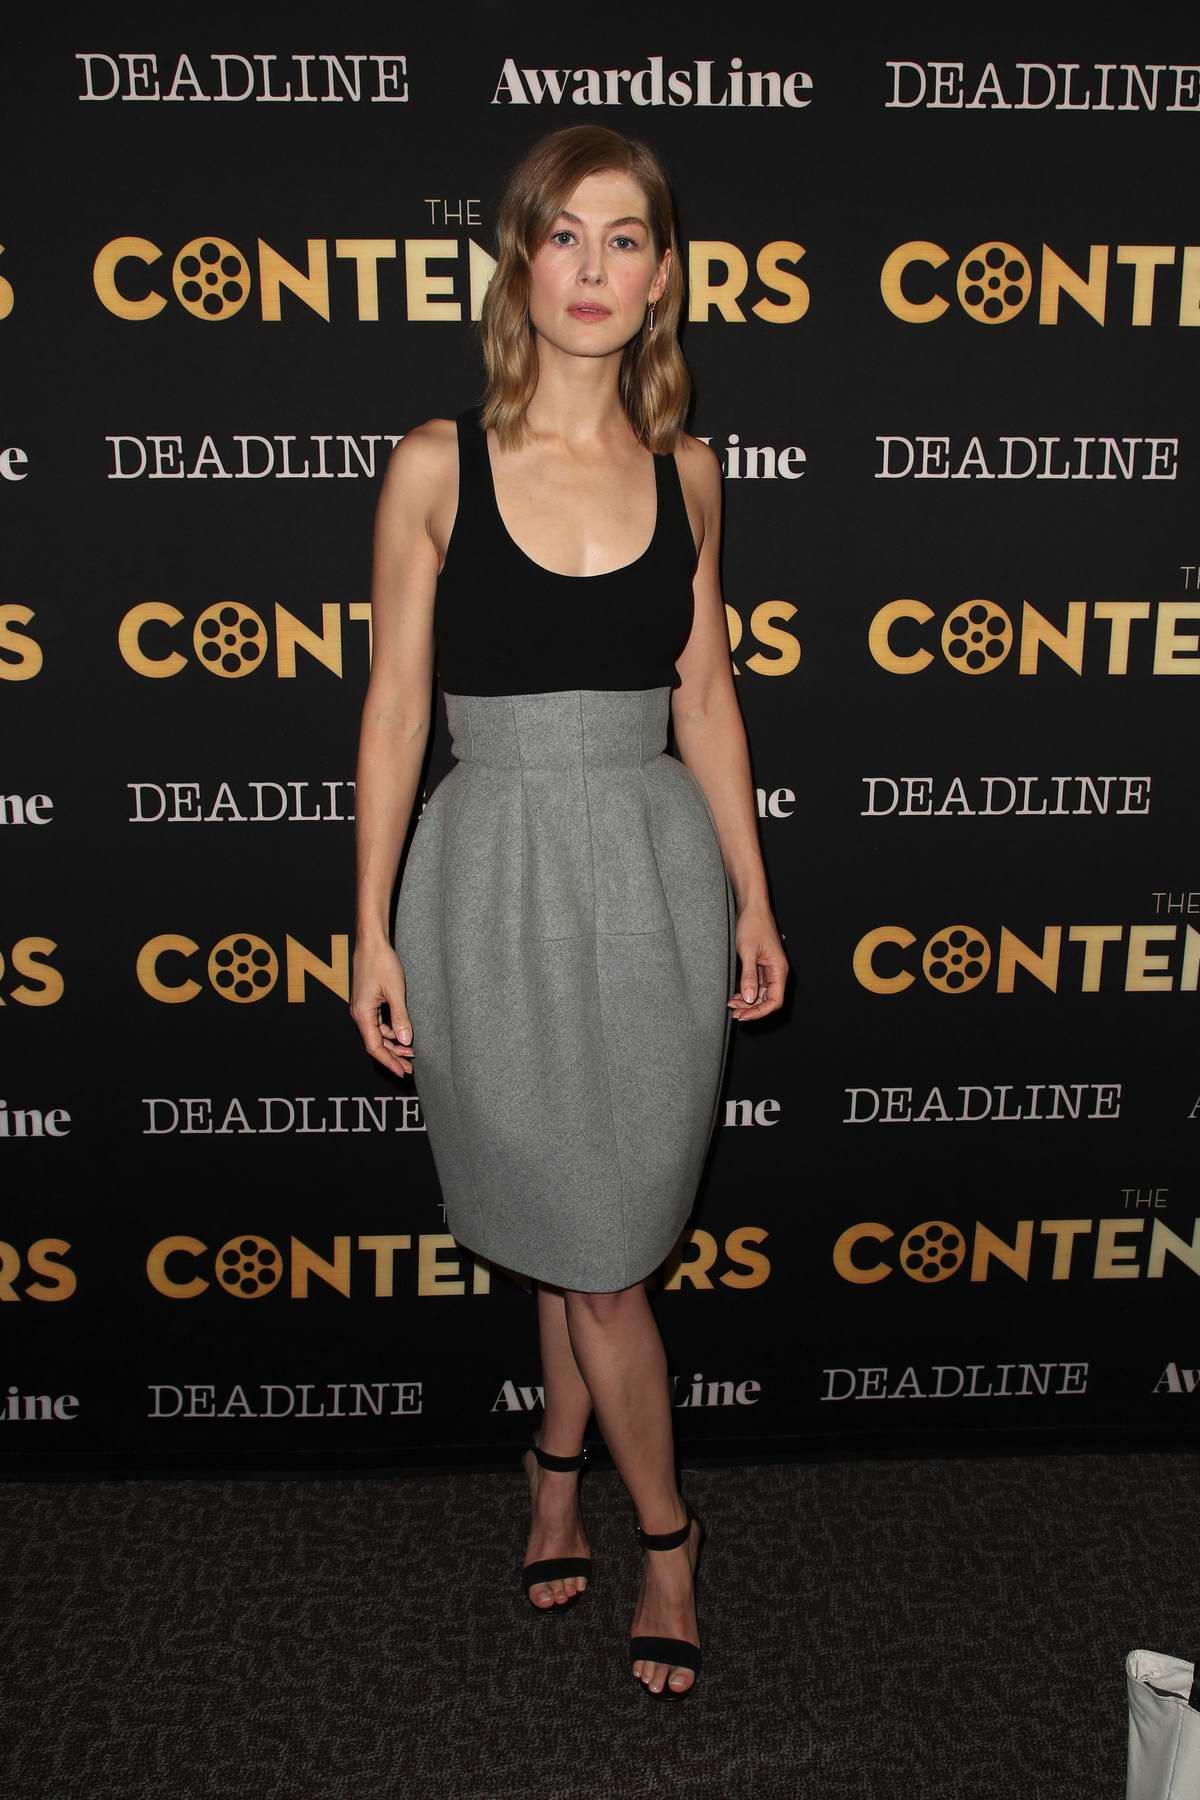 Rosemund Pike attending Deadline Hollywood presents 'The Contenders' in Los Angeles